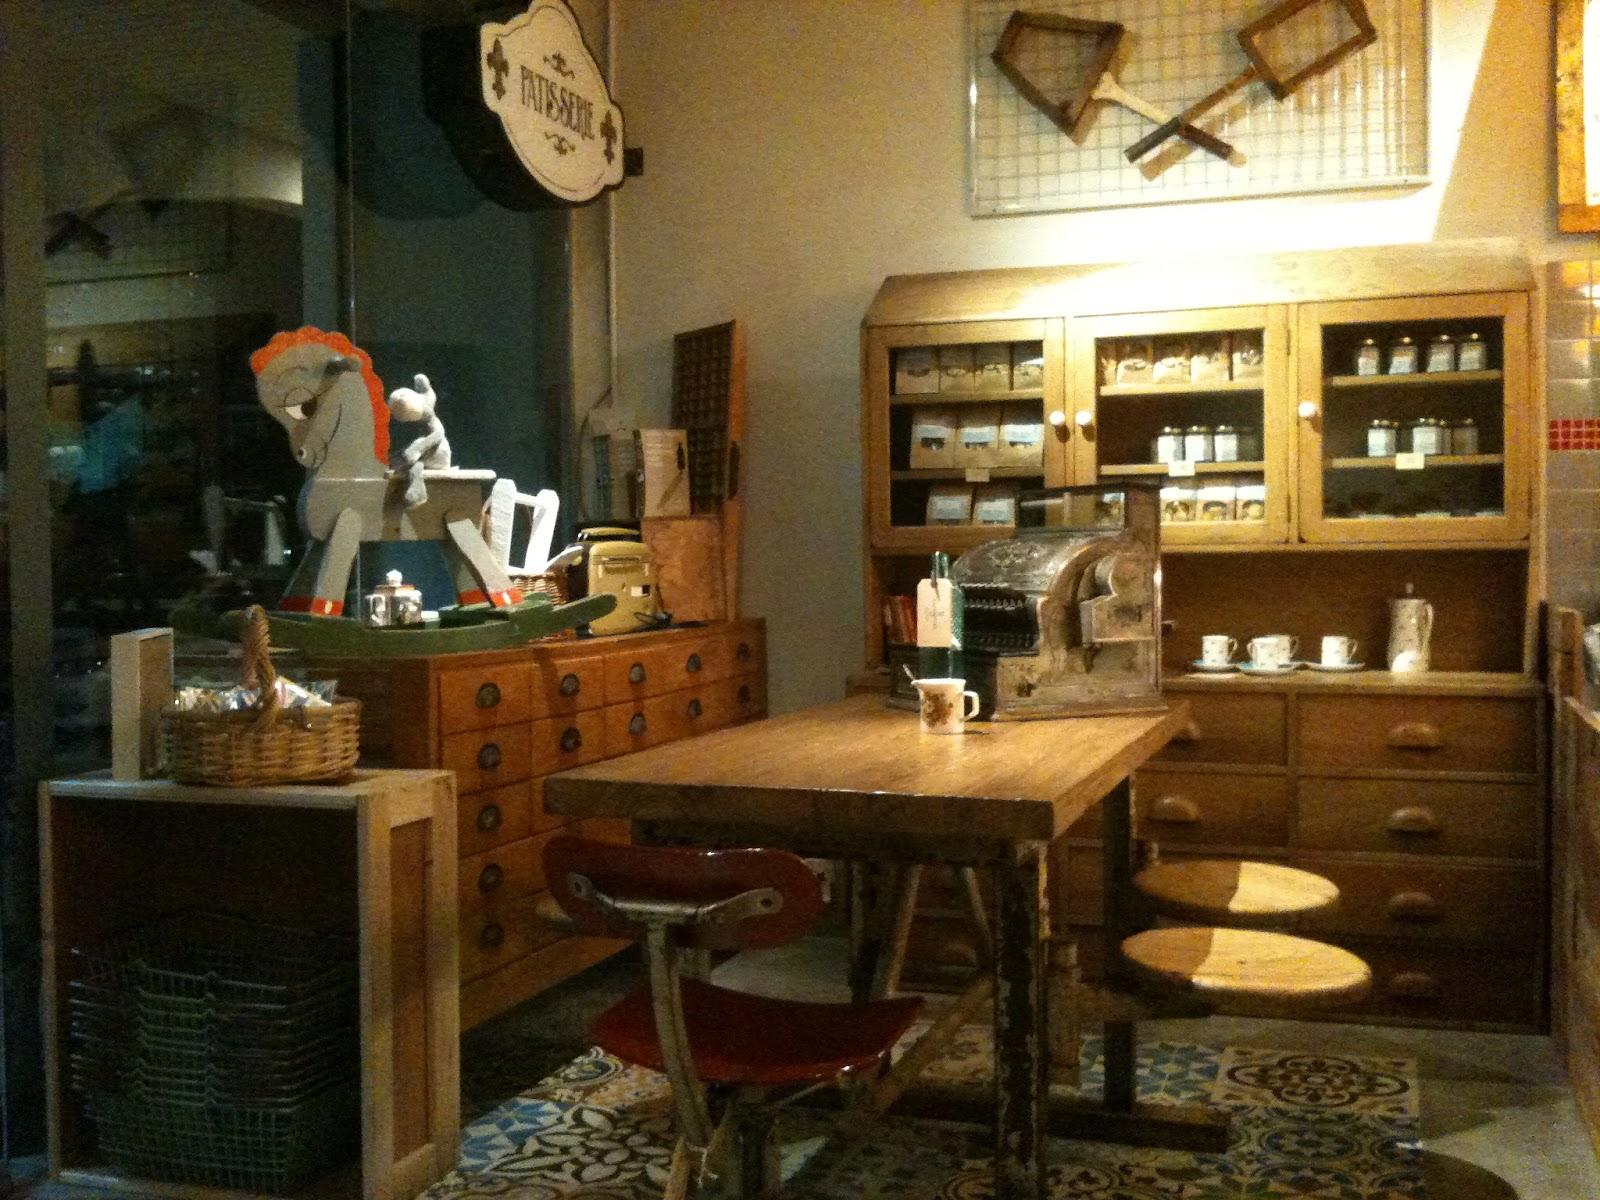 Trackfindings cafes interior design decoration - Interior design and decoration ...